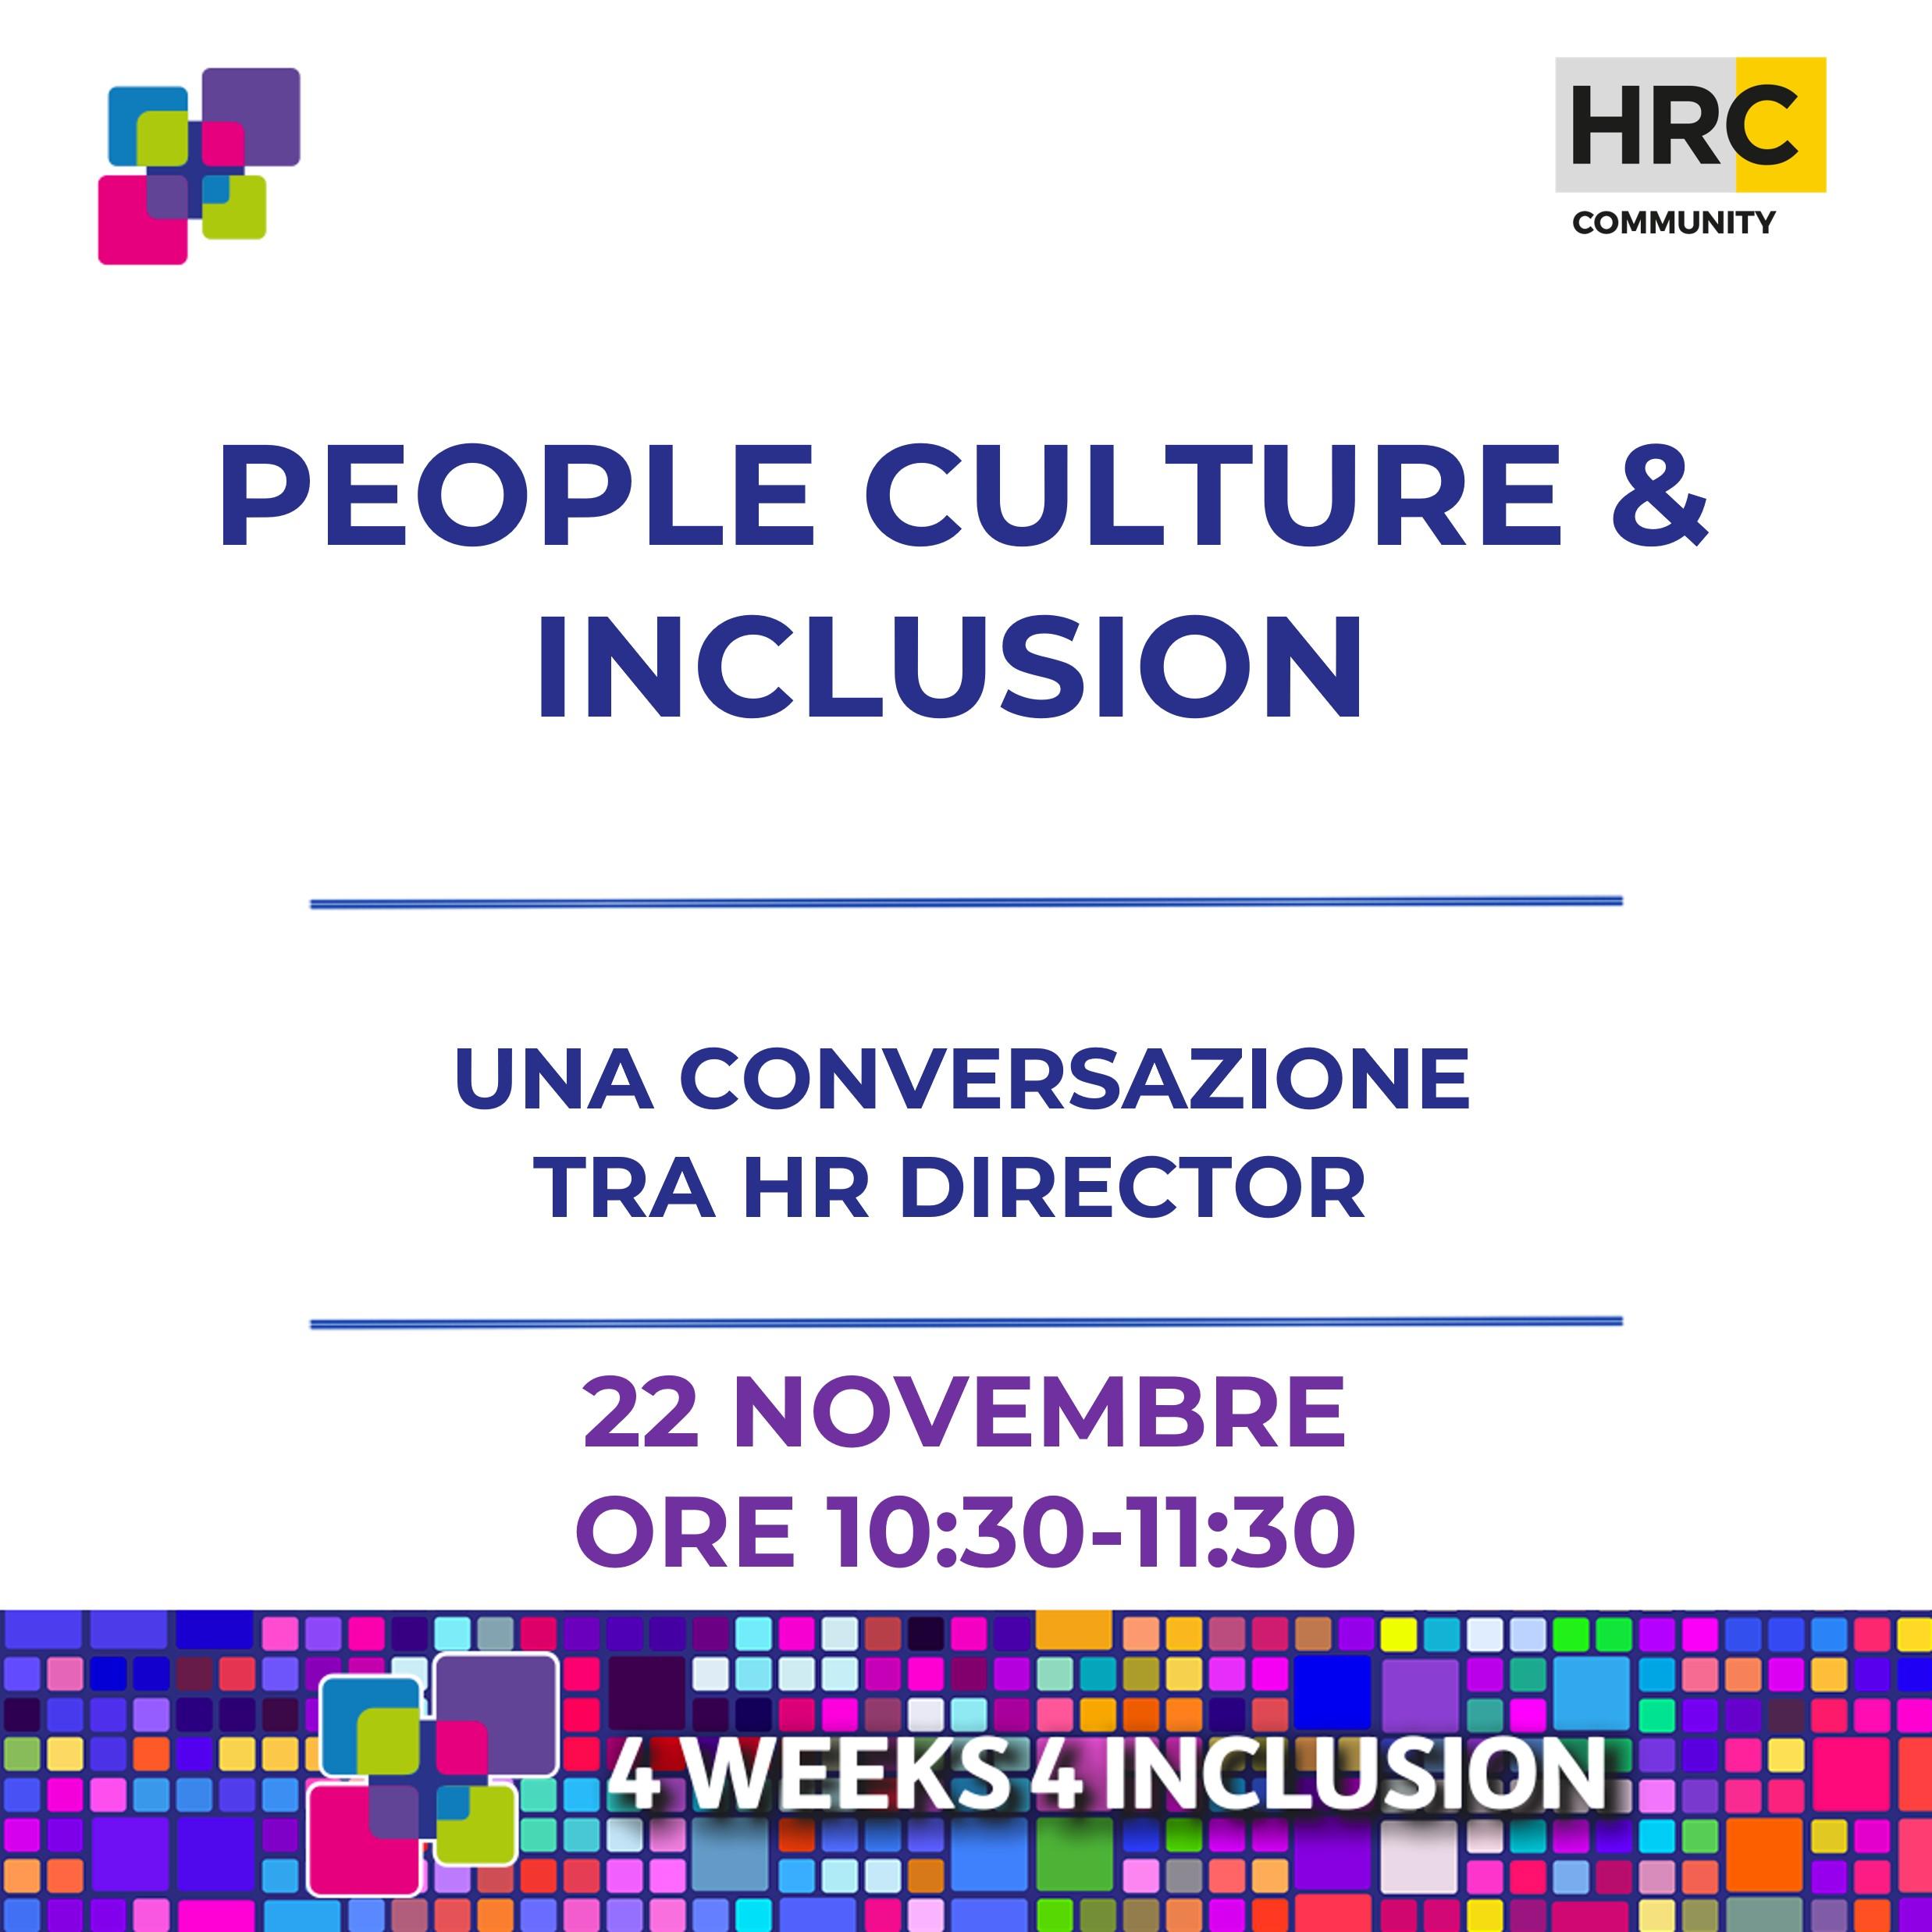 PEOPLE CULTURE & INCLUSION: UNA CONVERSAZIONE TRA HR DIRECTOR